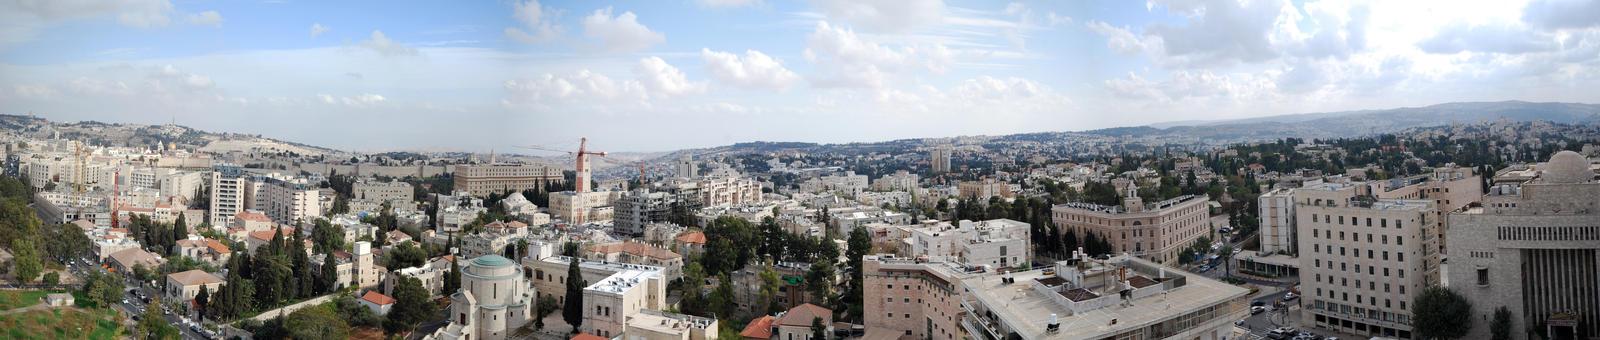 Jerusalem Panorama 2010, 1 by dpt56